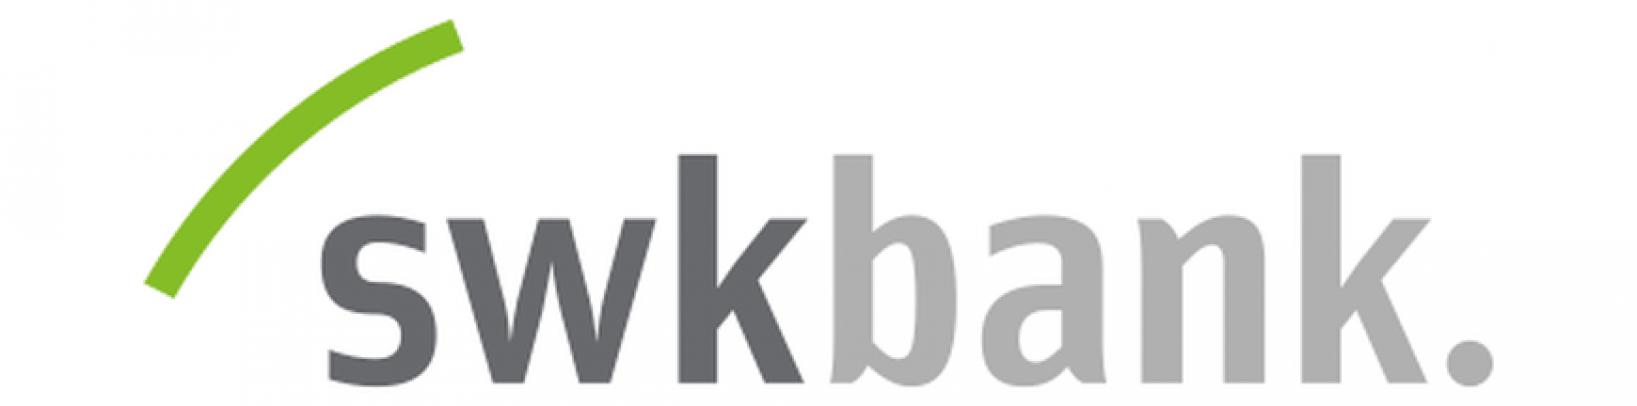 swk bank logo